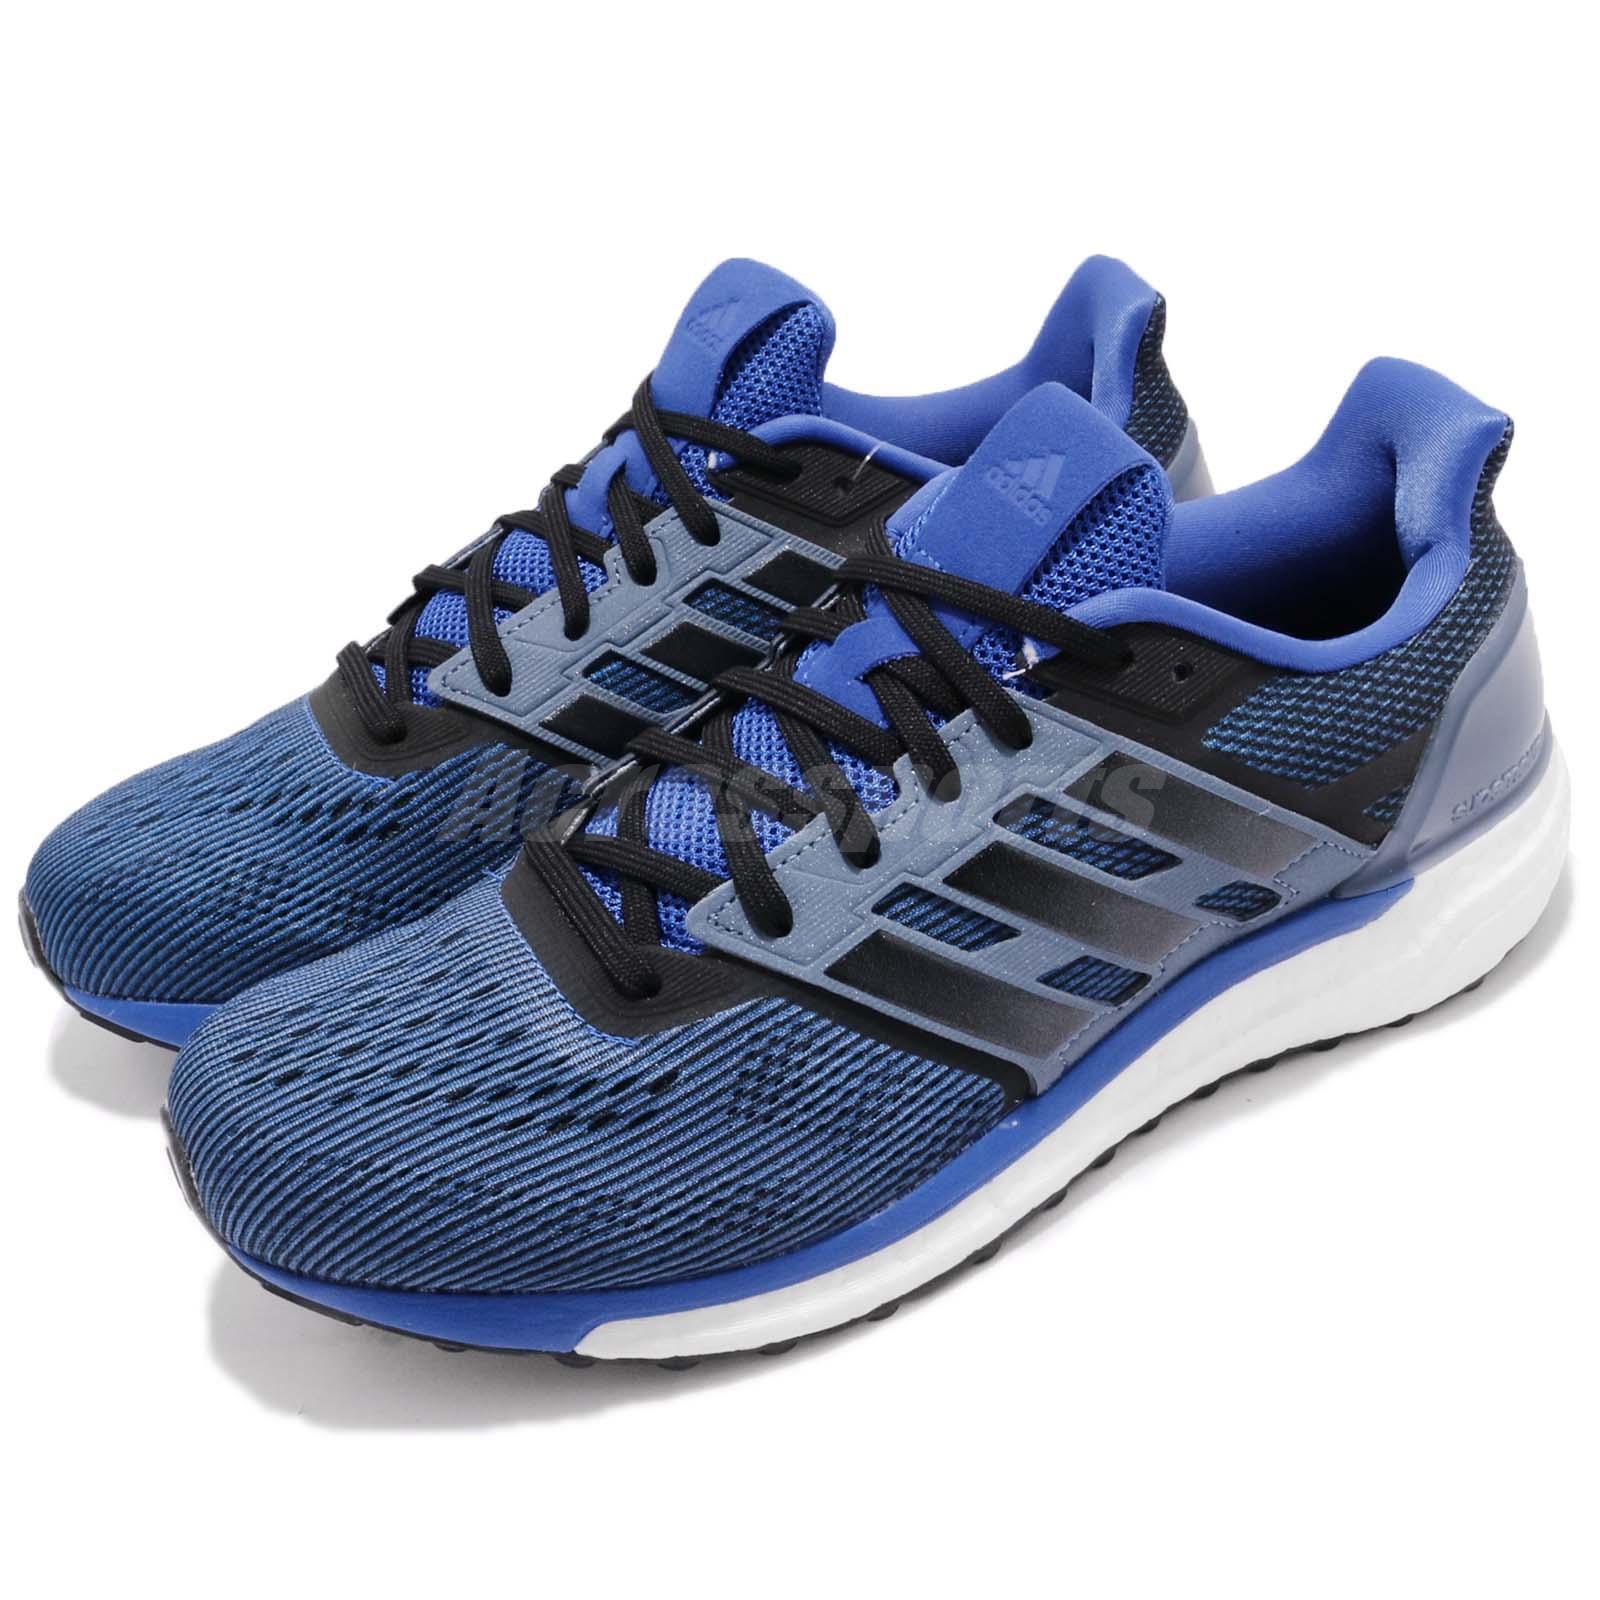 adidas Supernova M Hi-Res Bleu Noir Steel Homme Running Chaussures Sneakers CG4020